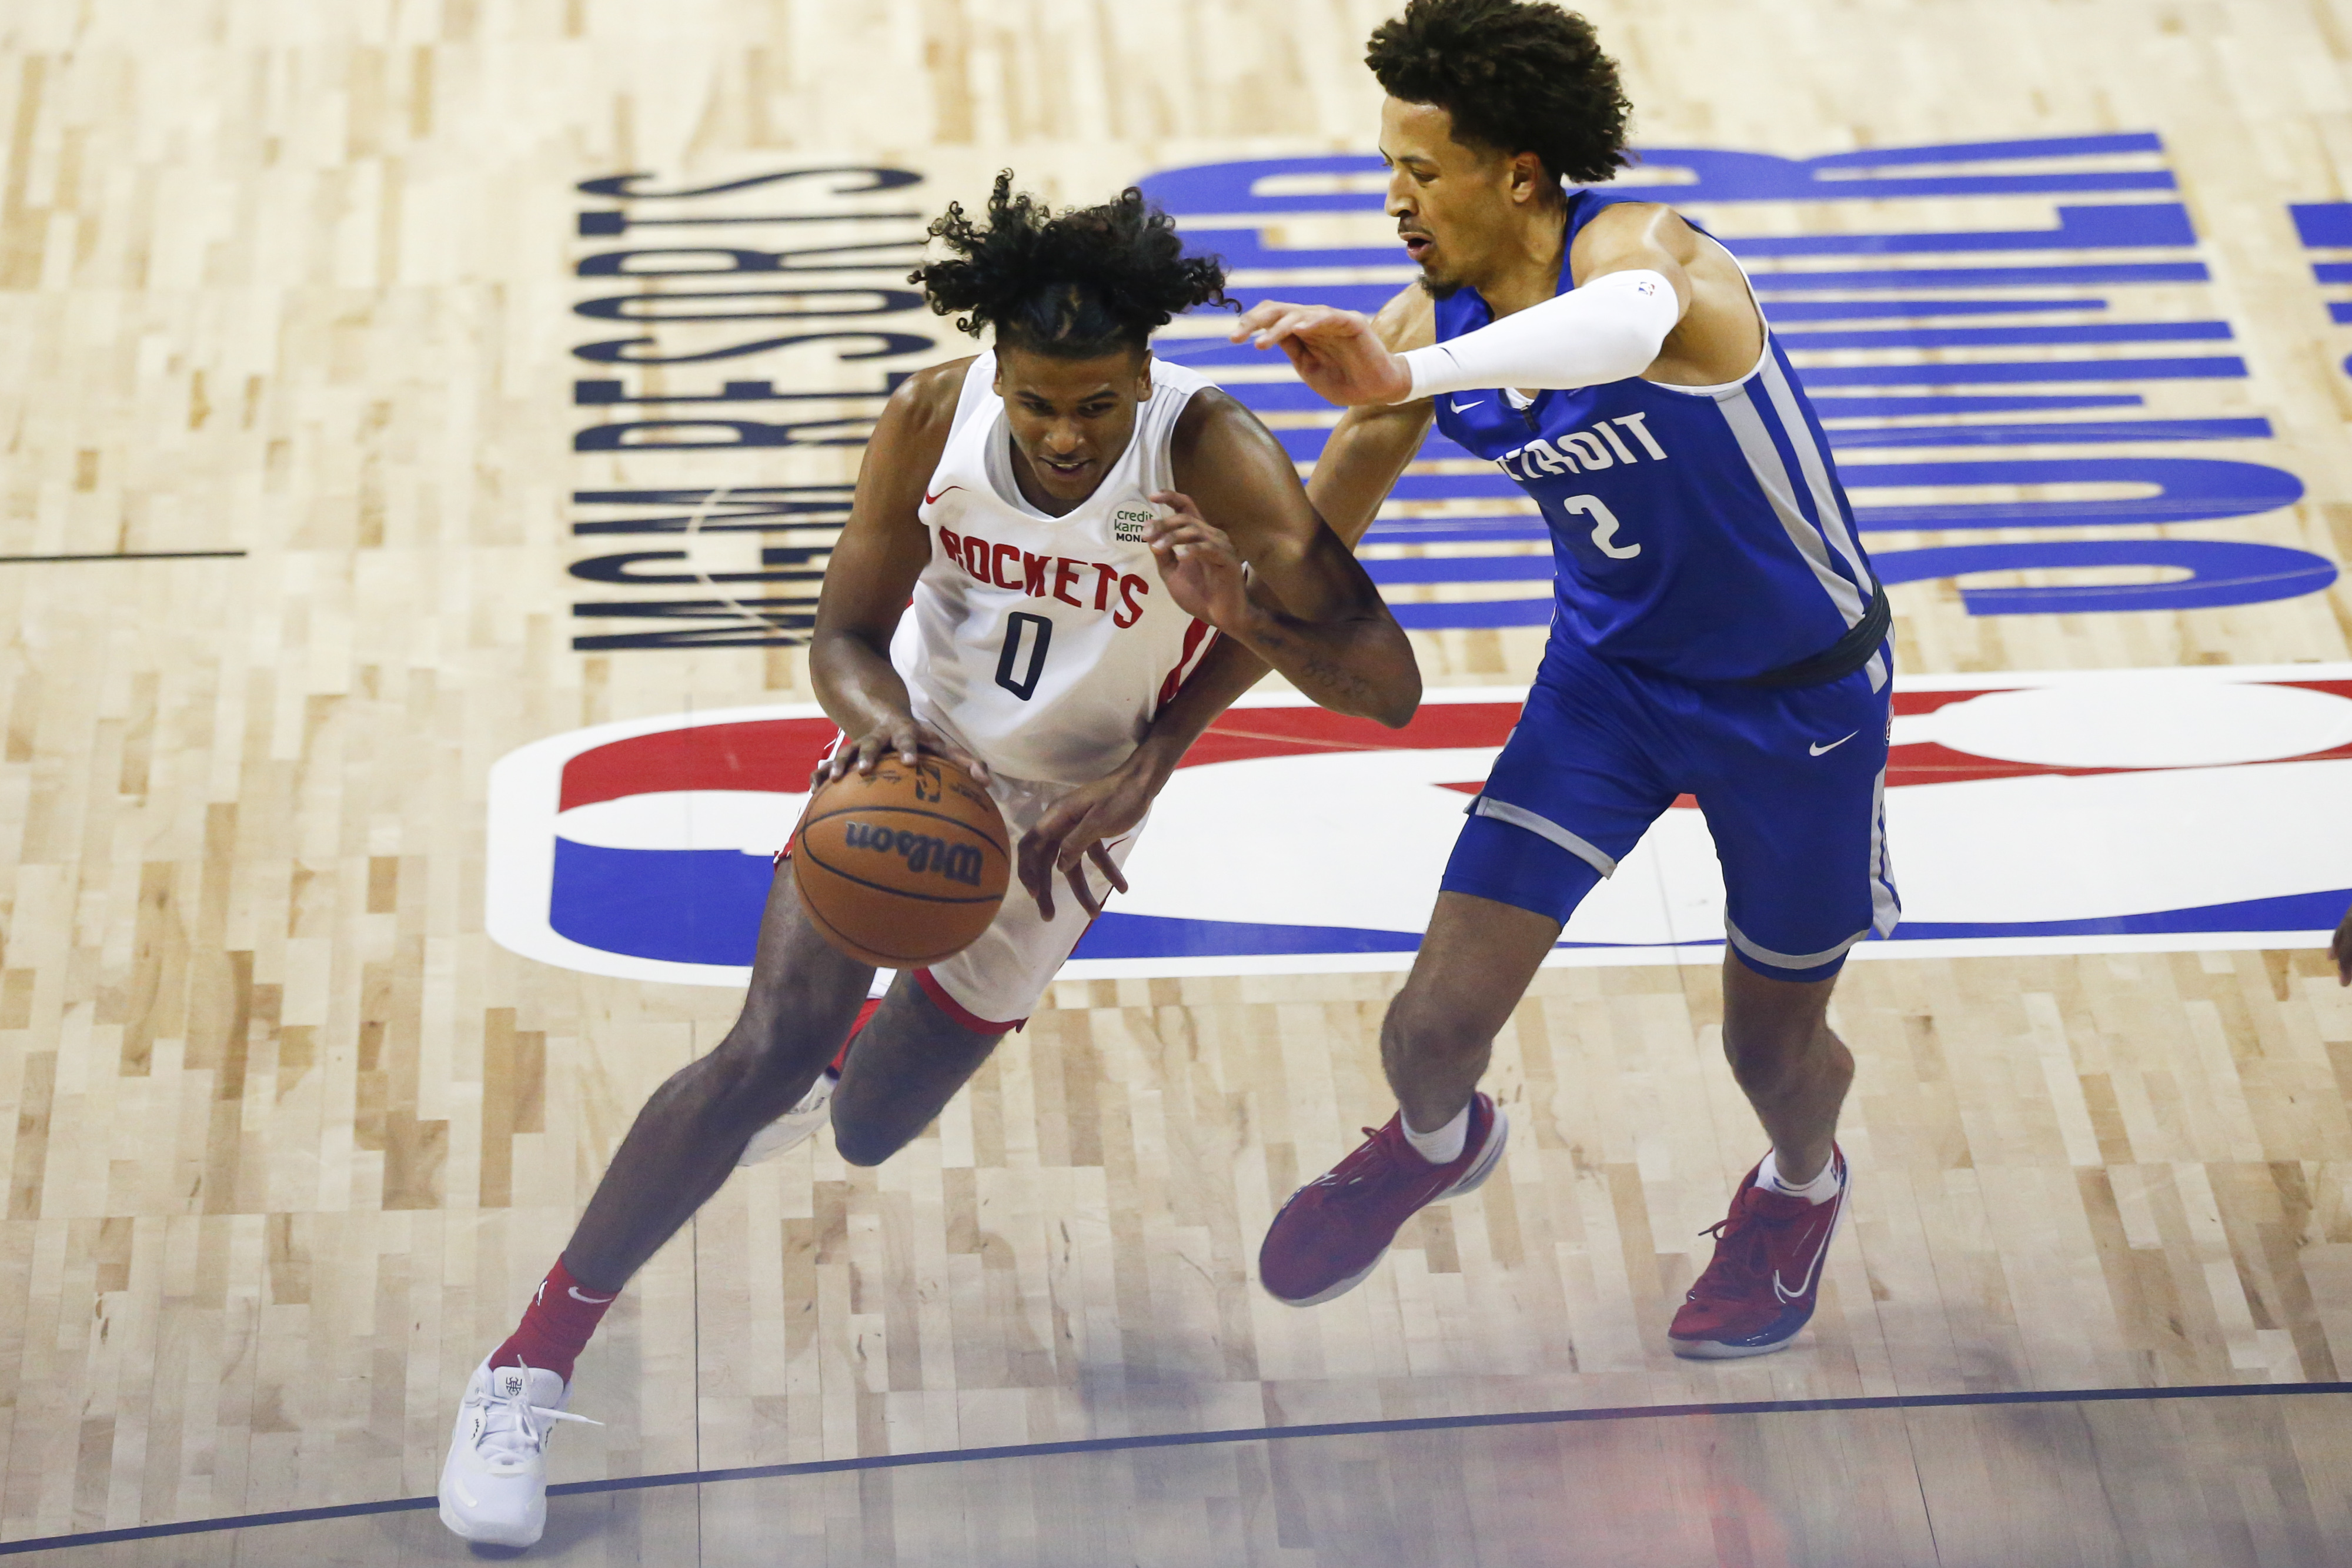 Houston Rockets' Jalen Green (0) drives to the basket under pressure from Detroit Pistons' Cade Cunningham (2).